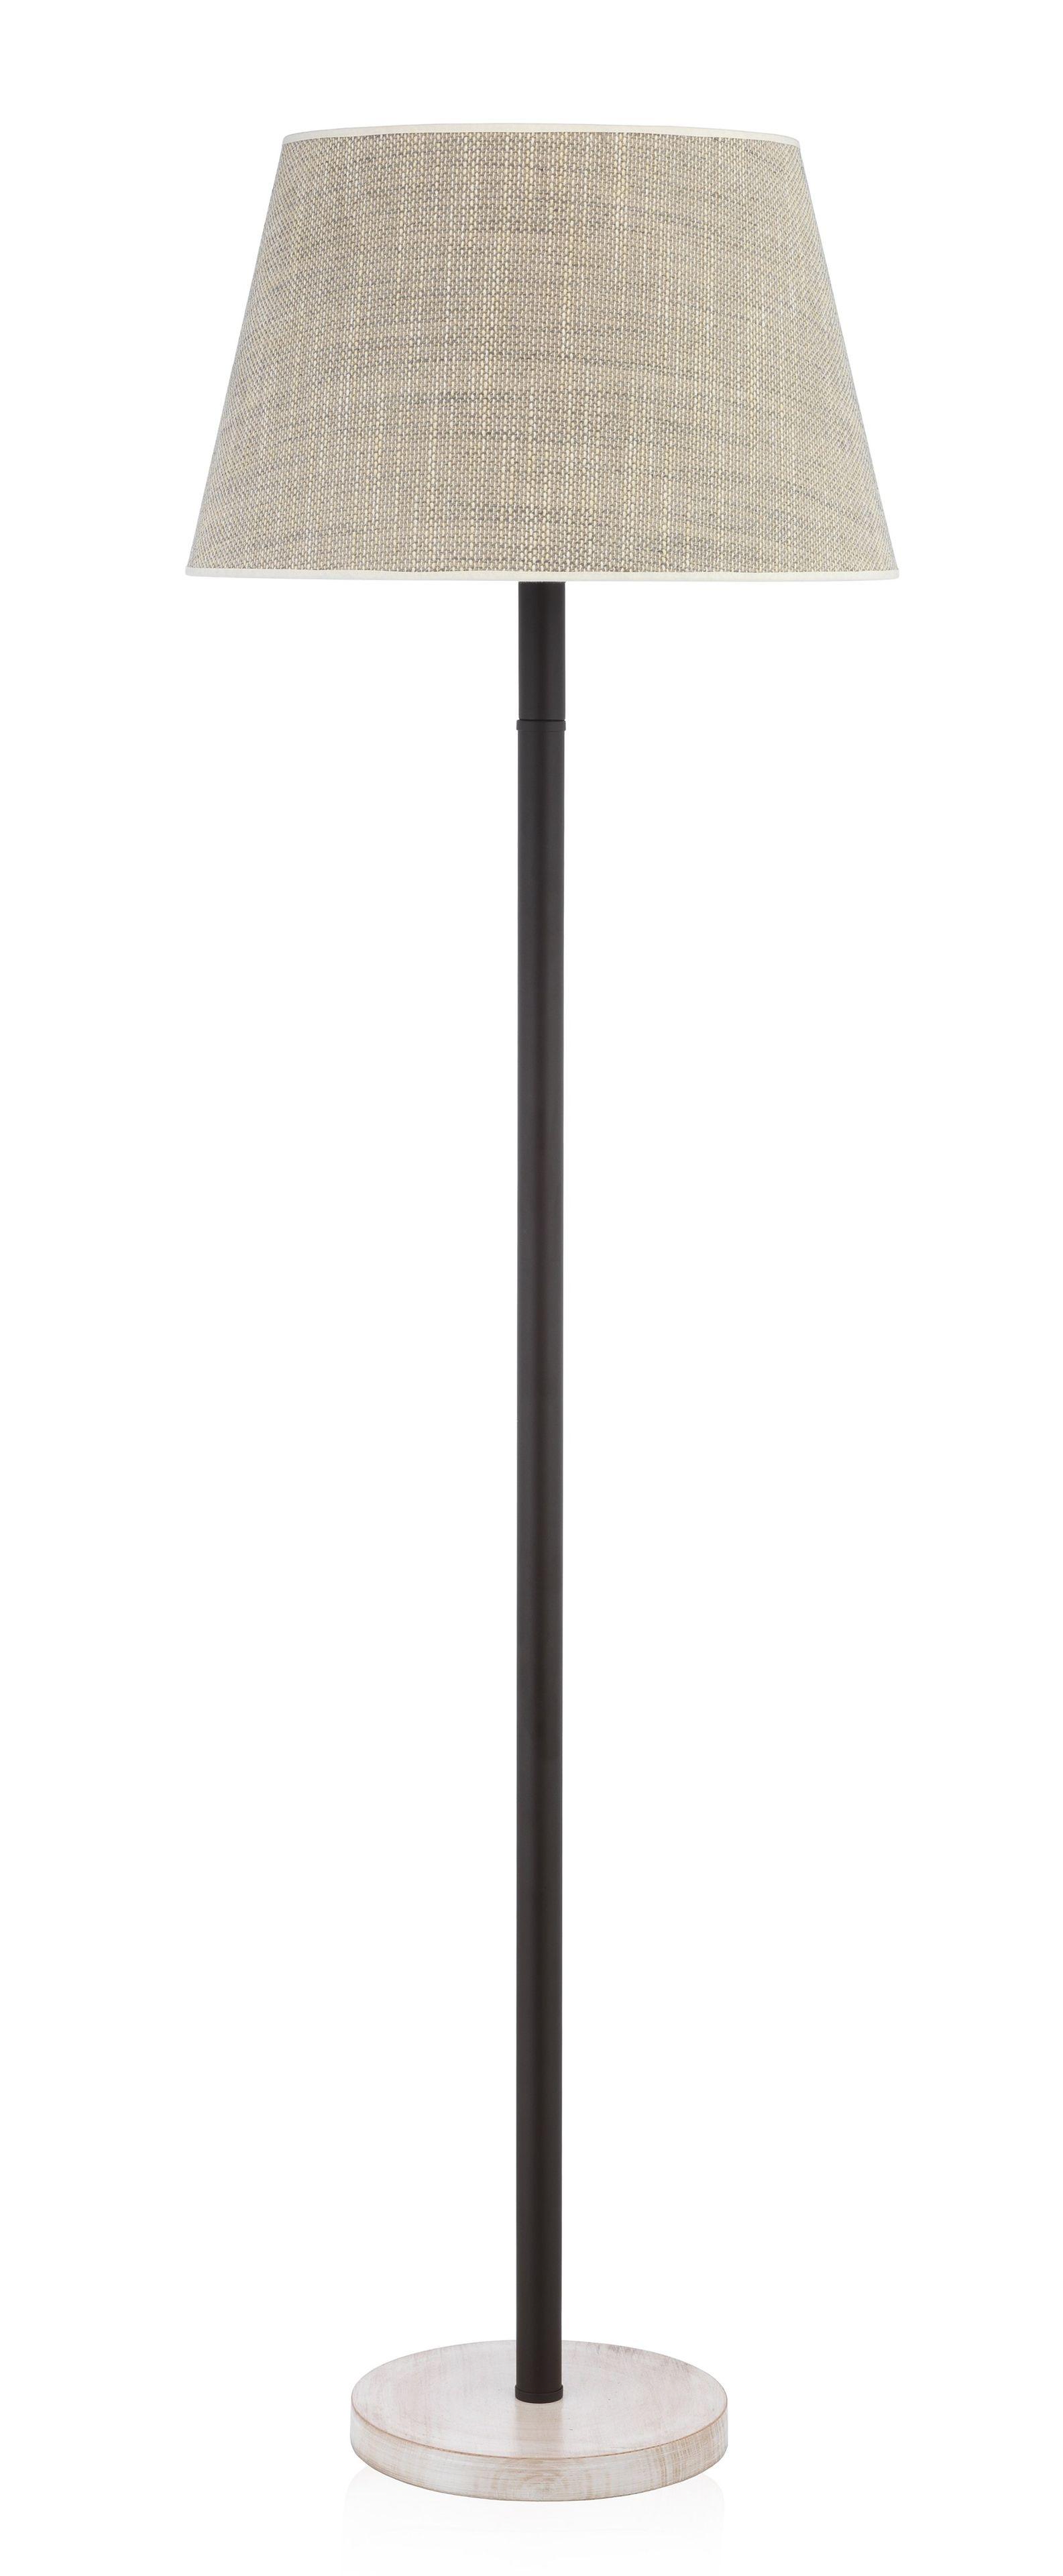 Traditional floor lamp - Traditional Floor Lamp 40